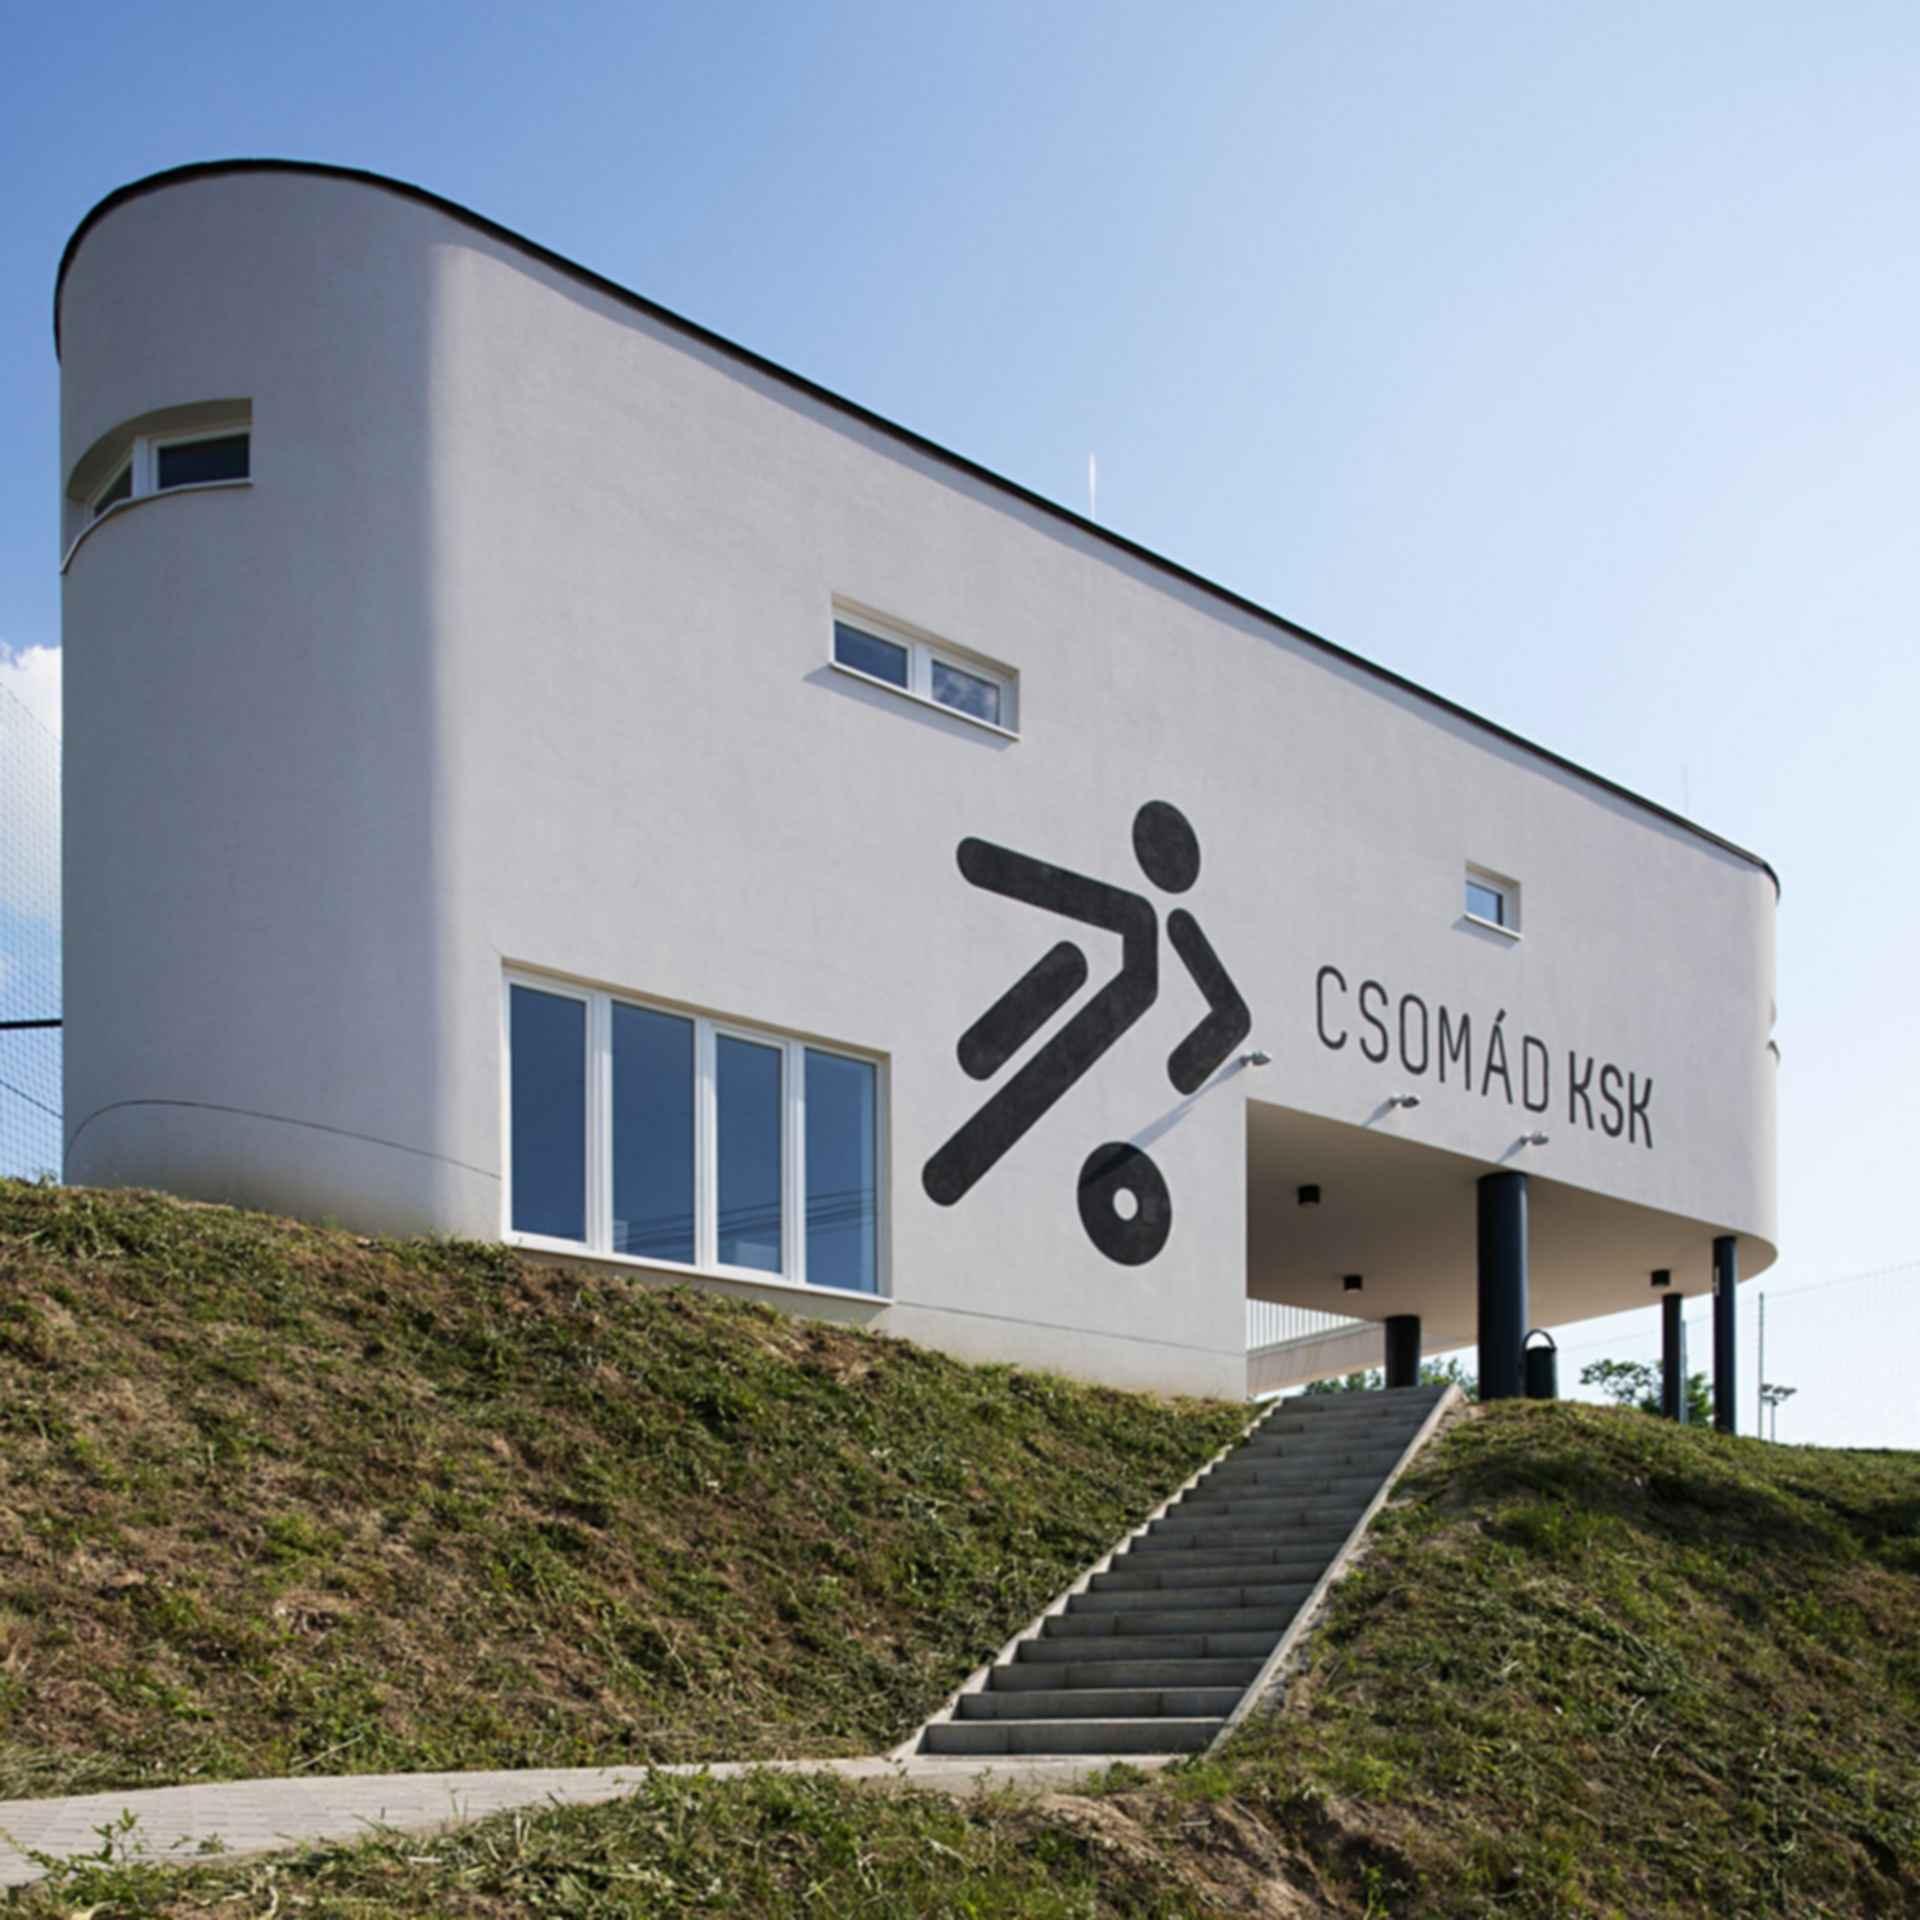 Sports Center Csomad - Exterior/Entrance